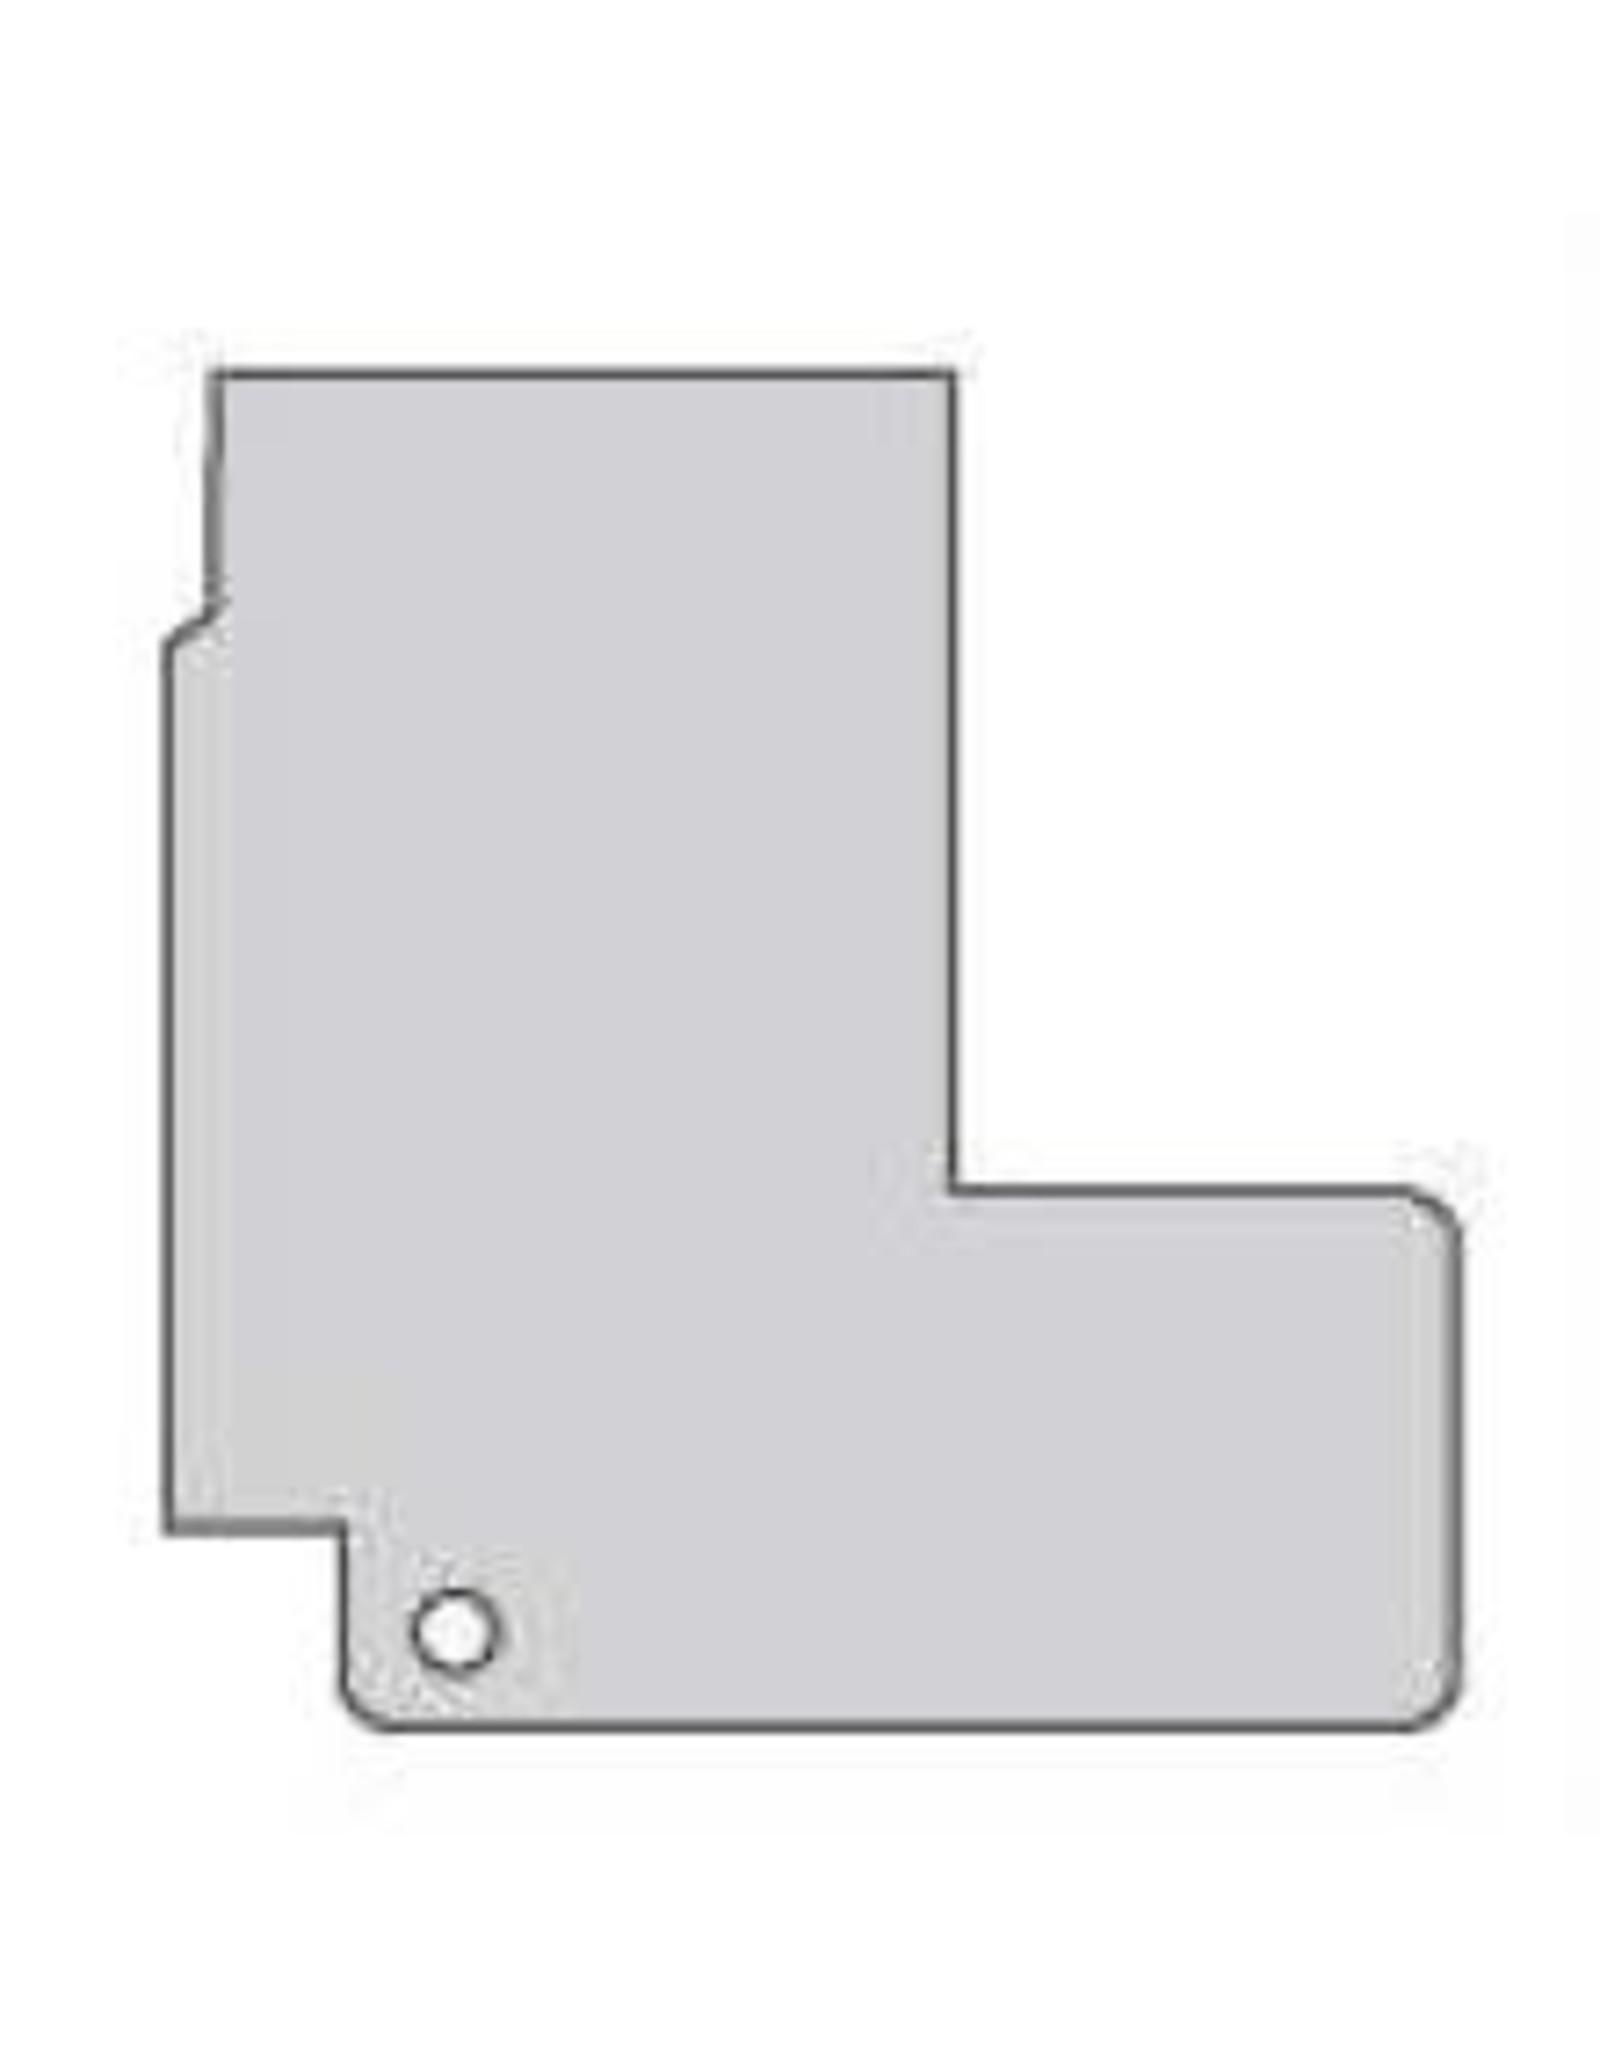 Isolation plate (10 units/bag)